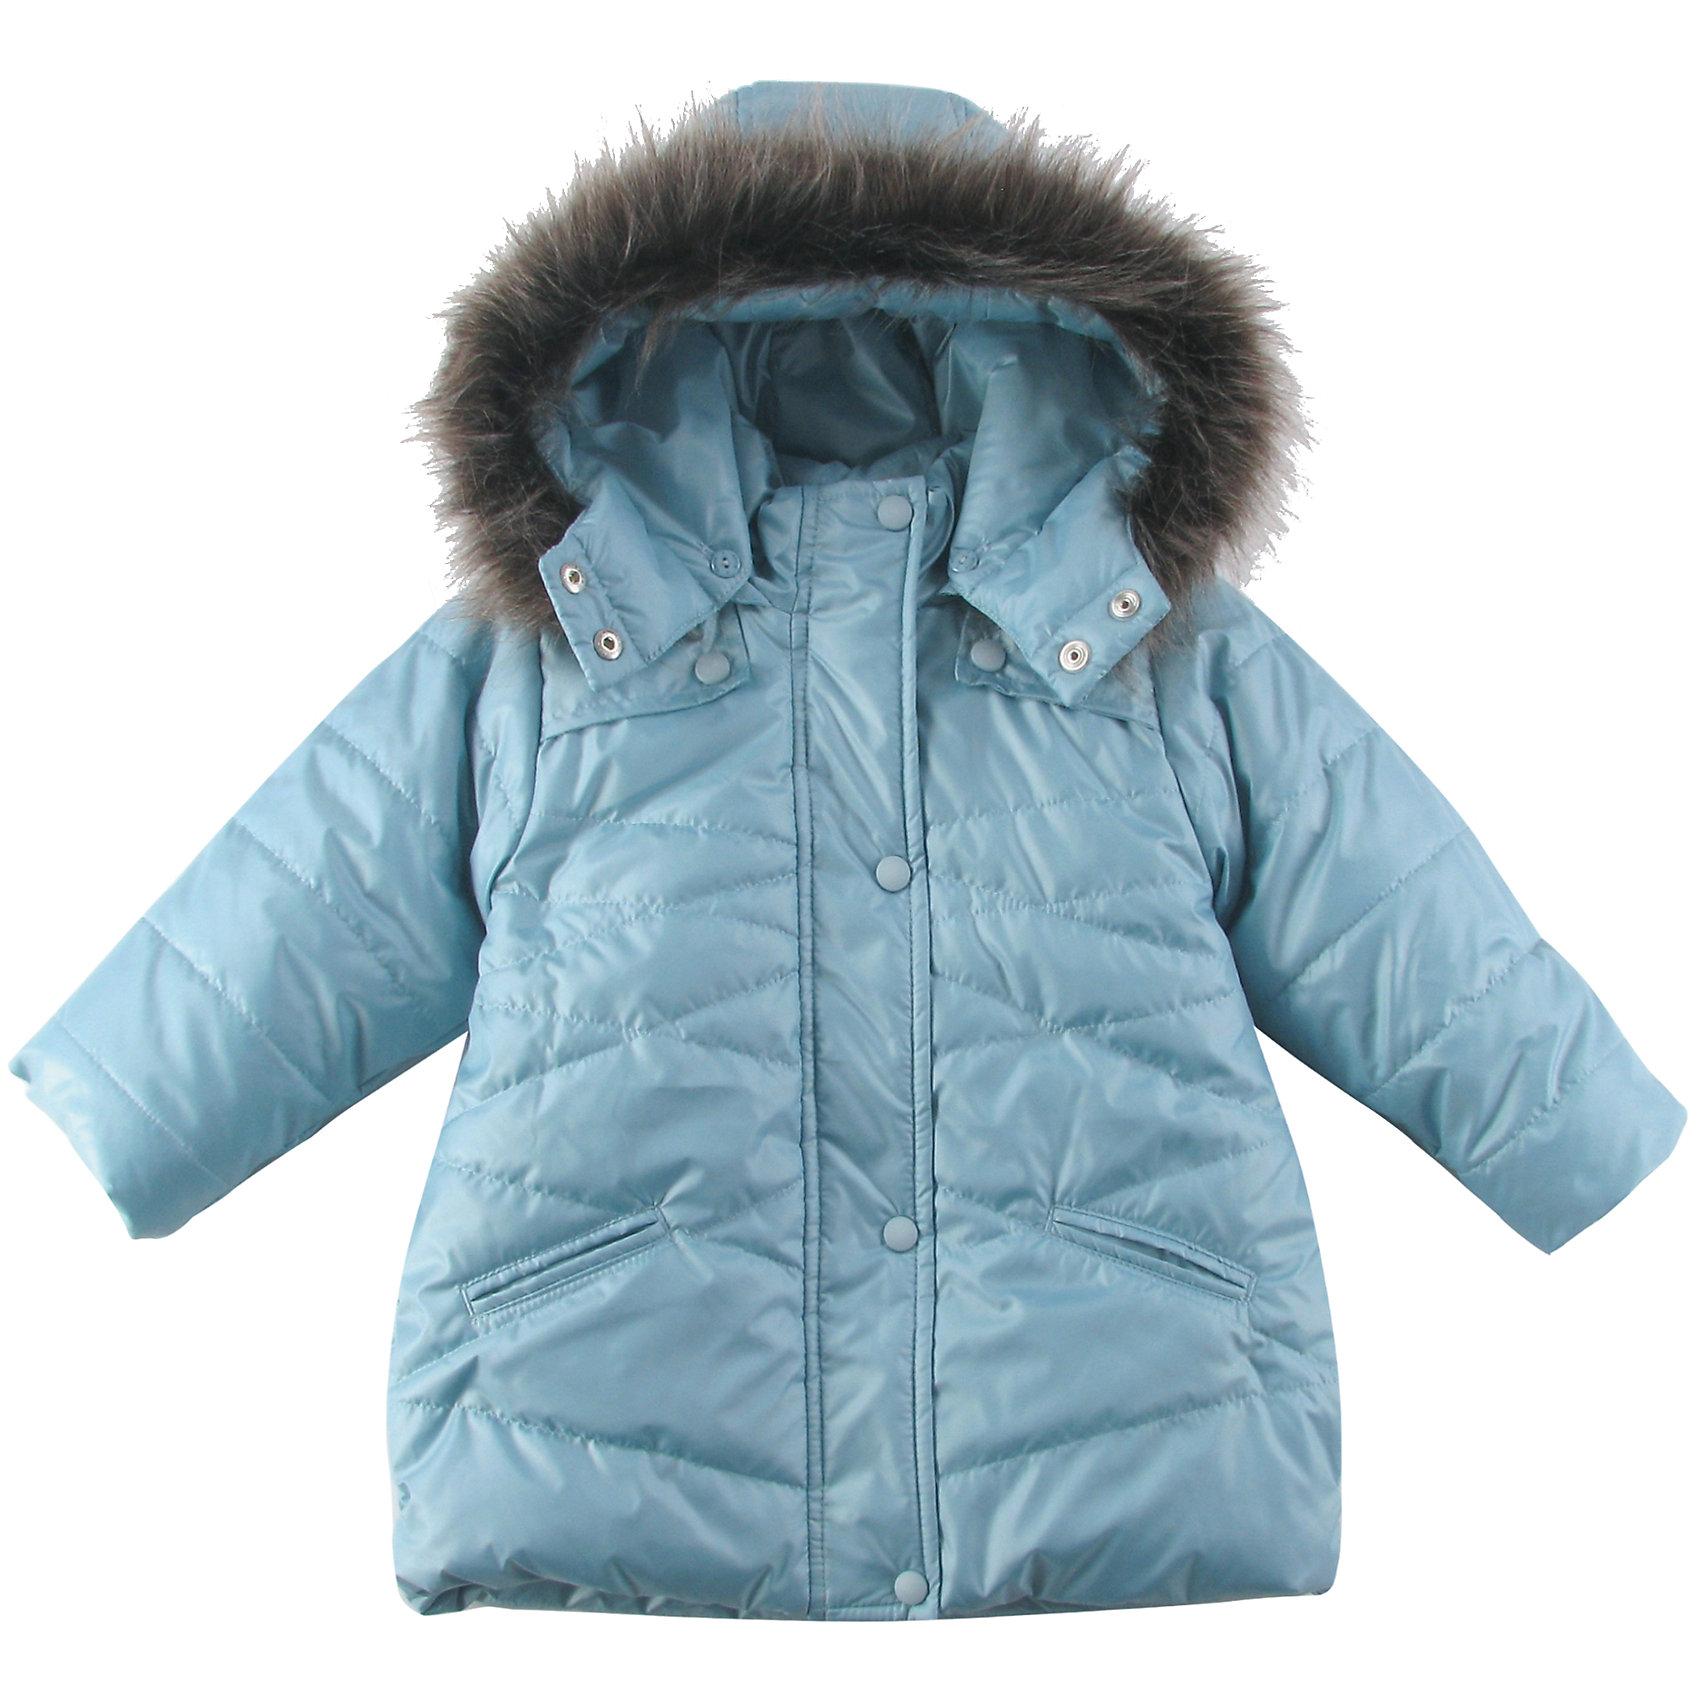 Куртка утепленная для девочки WojcikВерхняя одежда<br>Куртка утепленная для девочки Wojcik<br>Состав:<br>Полиэстер 100%<br><br>Ширина мм: 356<br>Глубина мм: 10<br>Высота мм: 245<br>Вес г: 519<br>Цвет: синий<br>Возраст от месяцев: 24<br>Возраст до месяцев: 36<br>Пол: Женский<br>Возраст: Детский<br>Размер: 98,74,80,86,92<br>SKU: 5590543